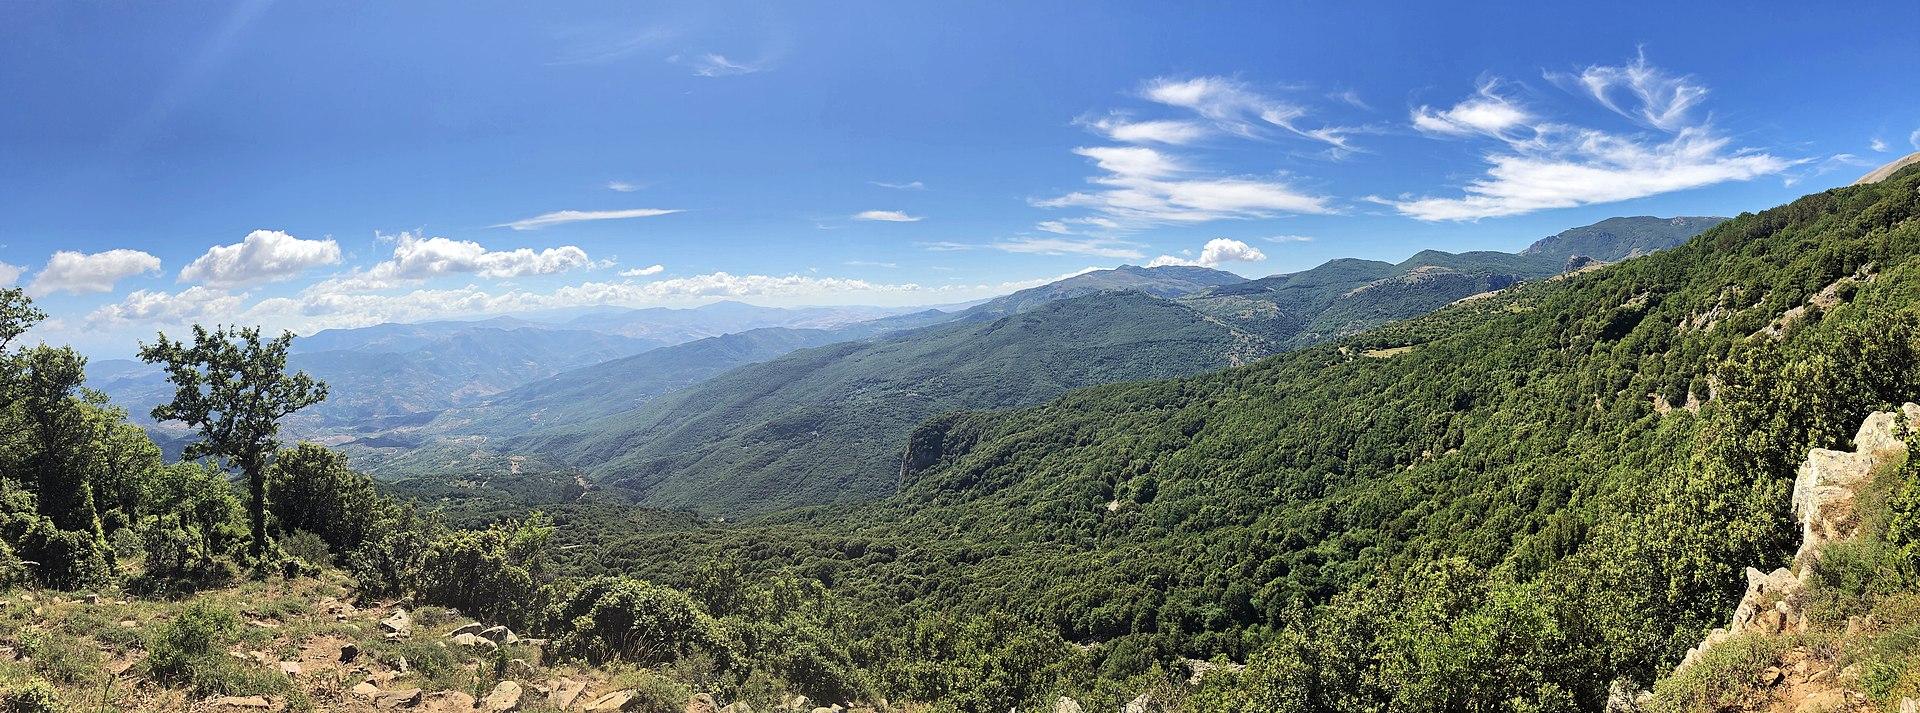 Panorama dal sentiero degli agrifogli.jpg